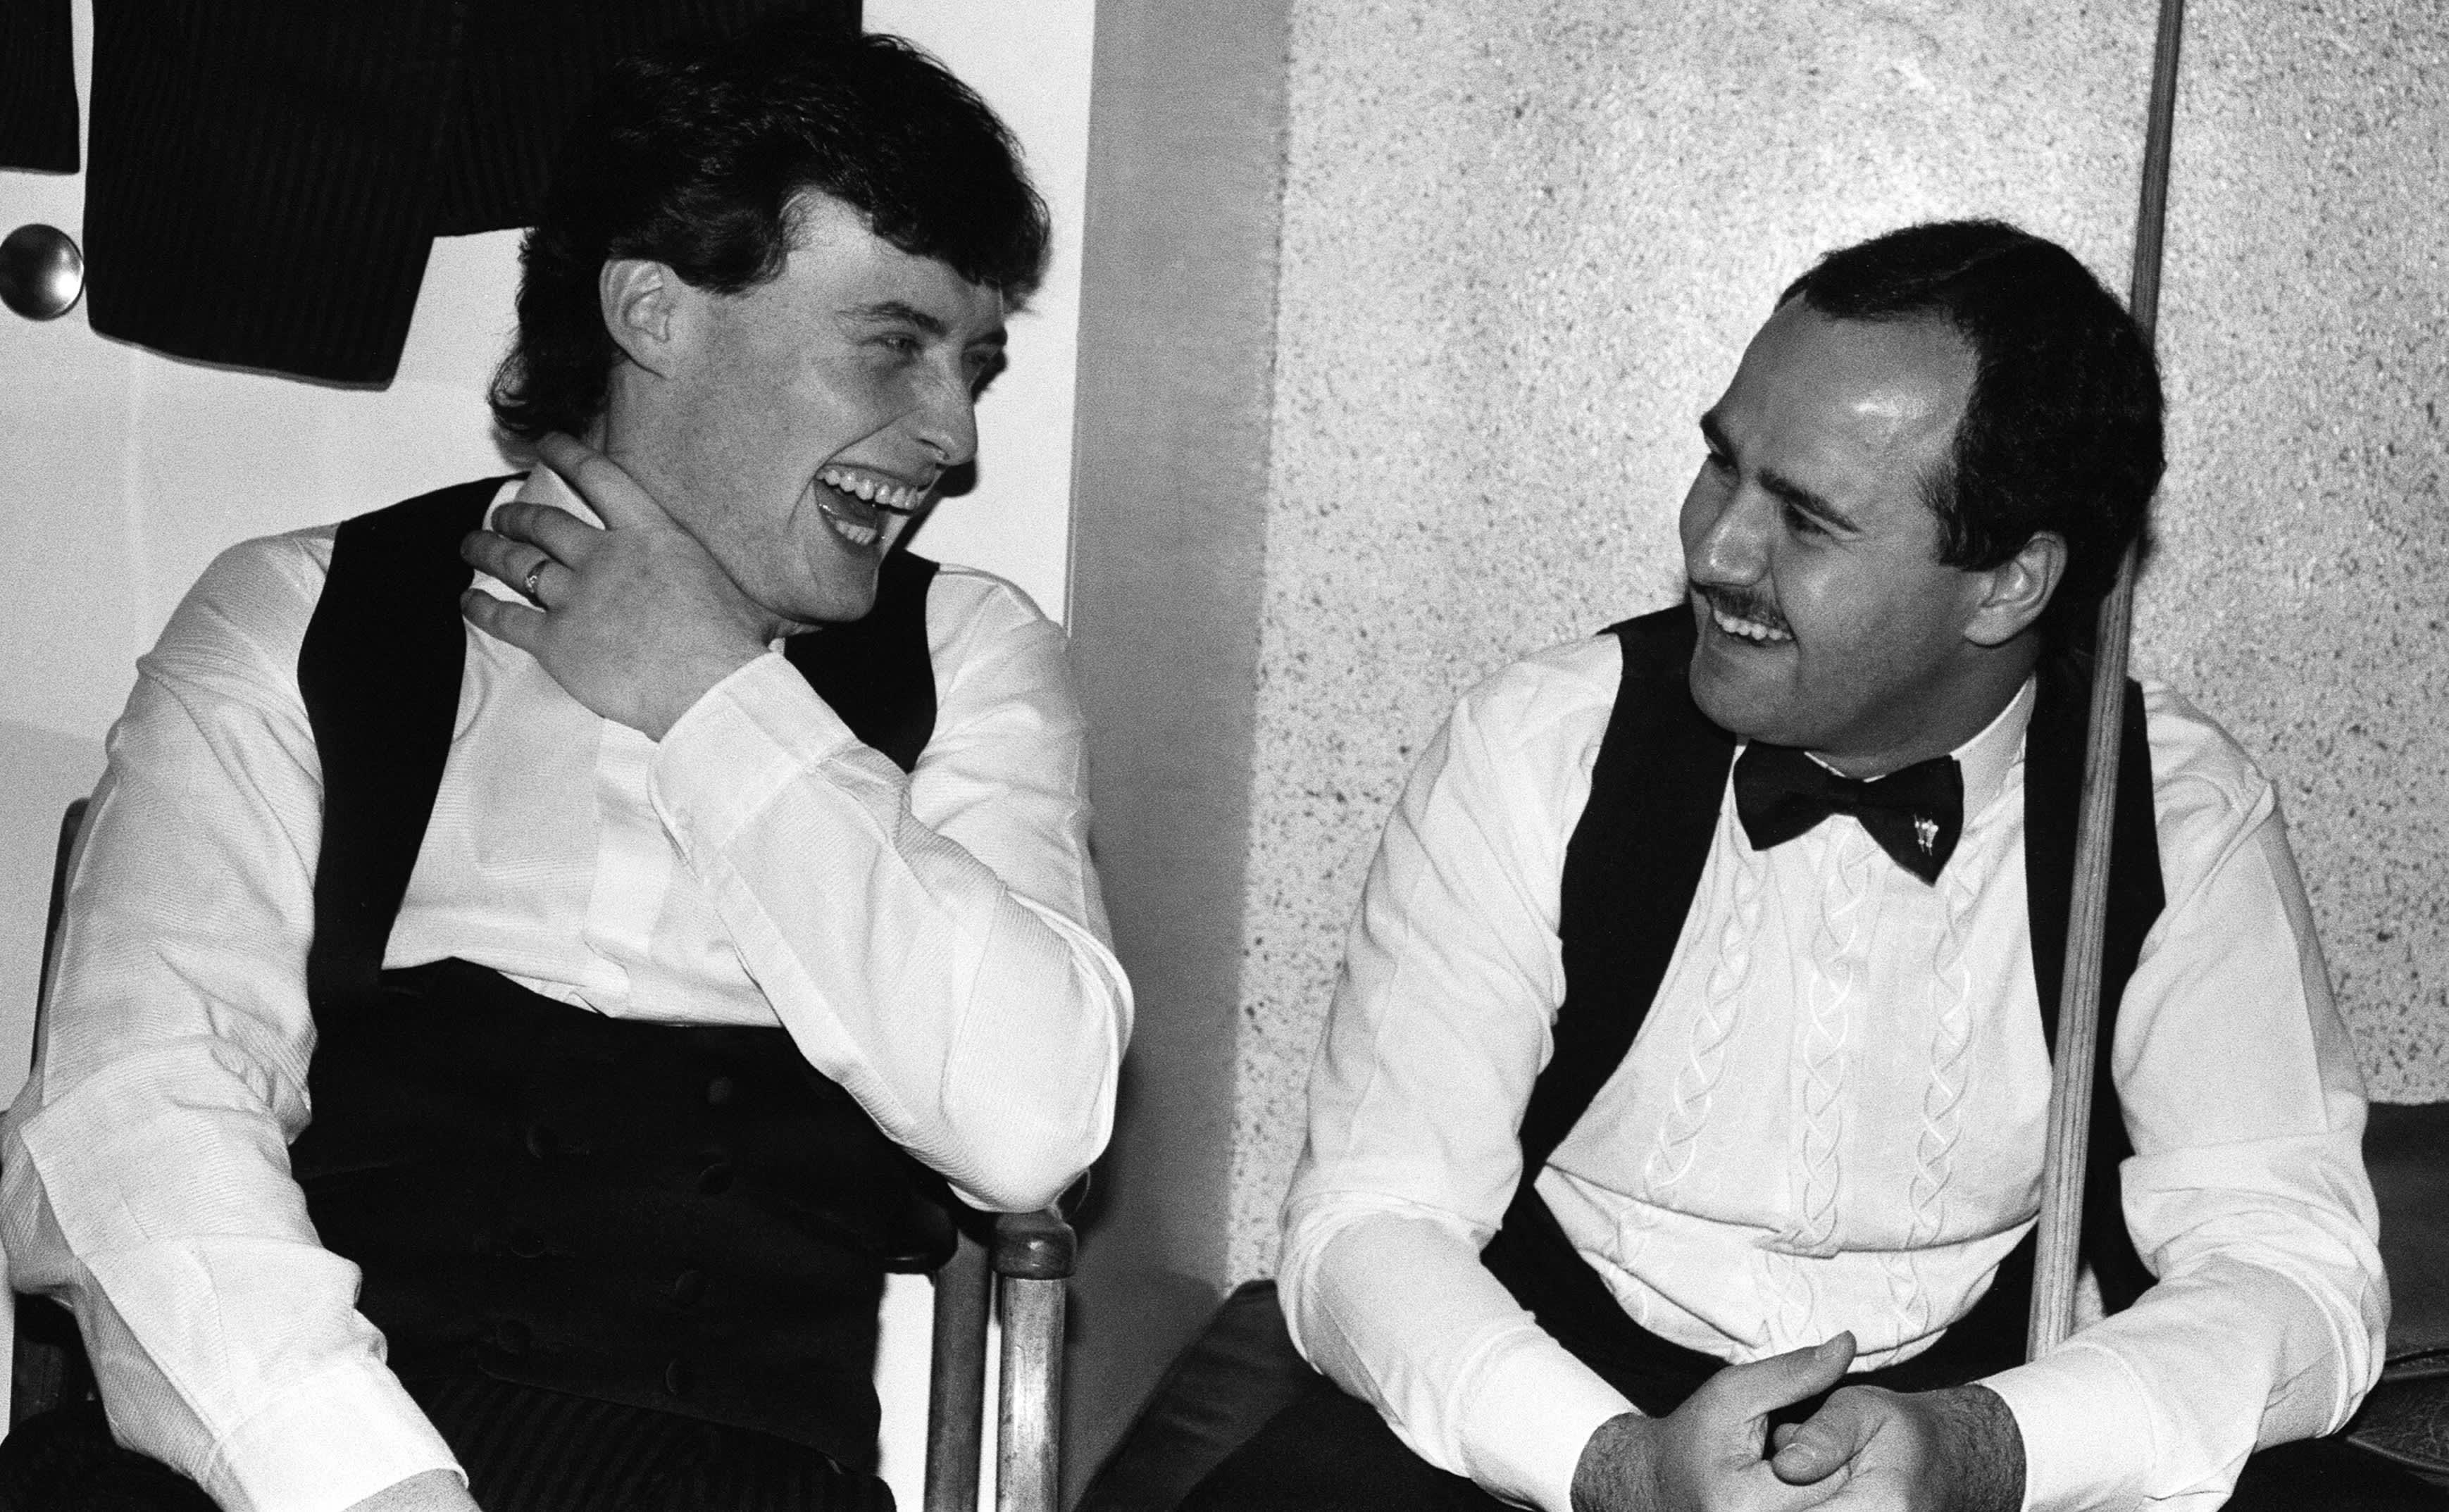 Jimmy White (vas.) ja Tony Meo ponnistivat snookerissa huipulle Lontoon Tootingista.